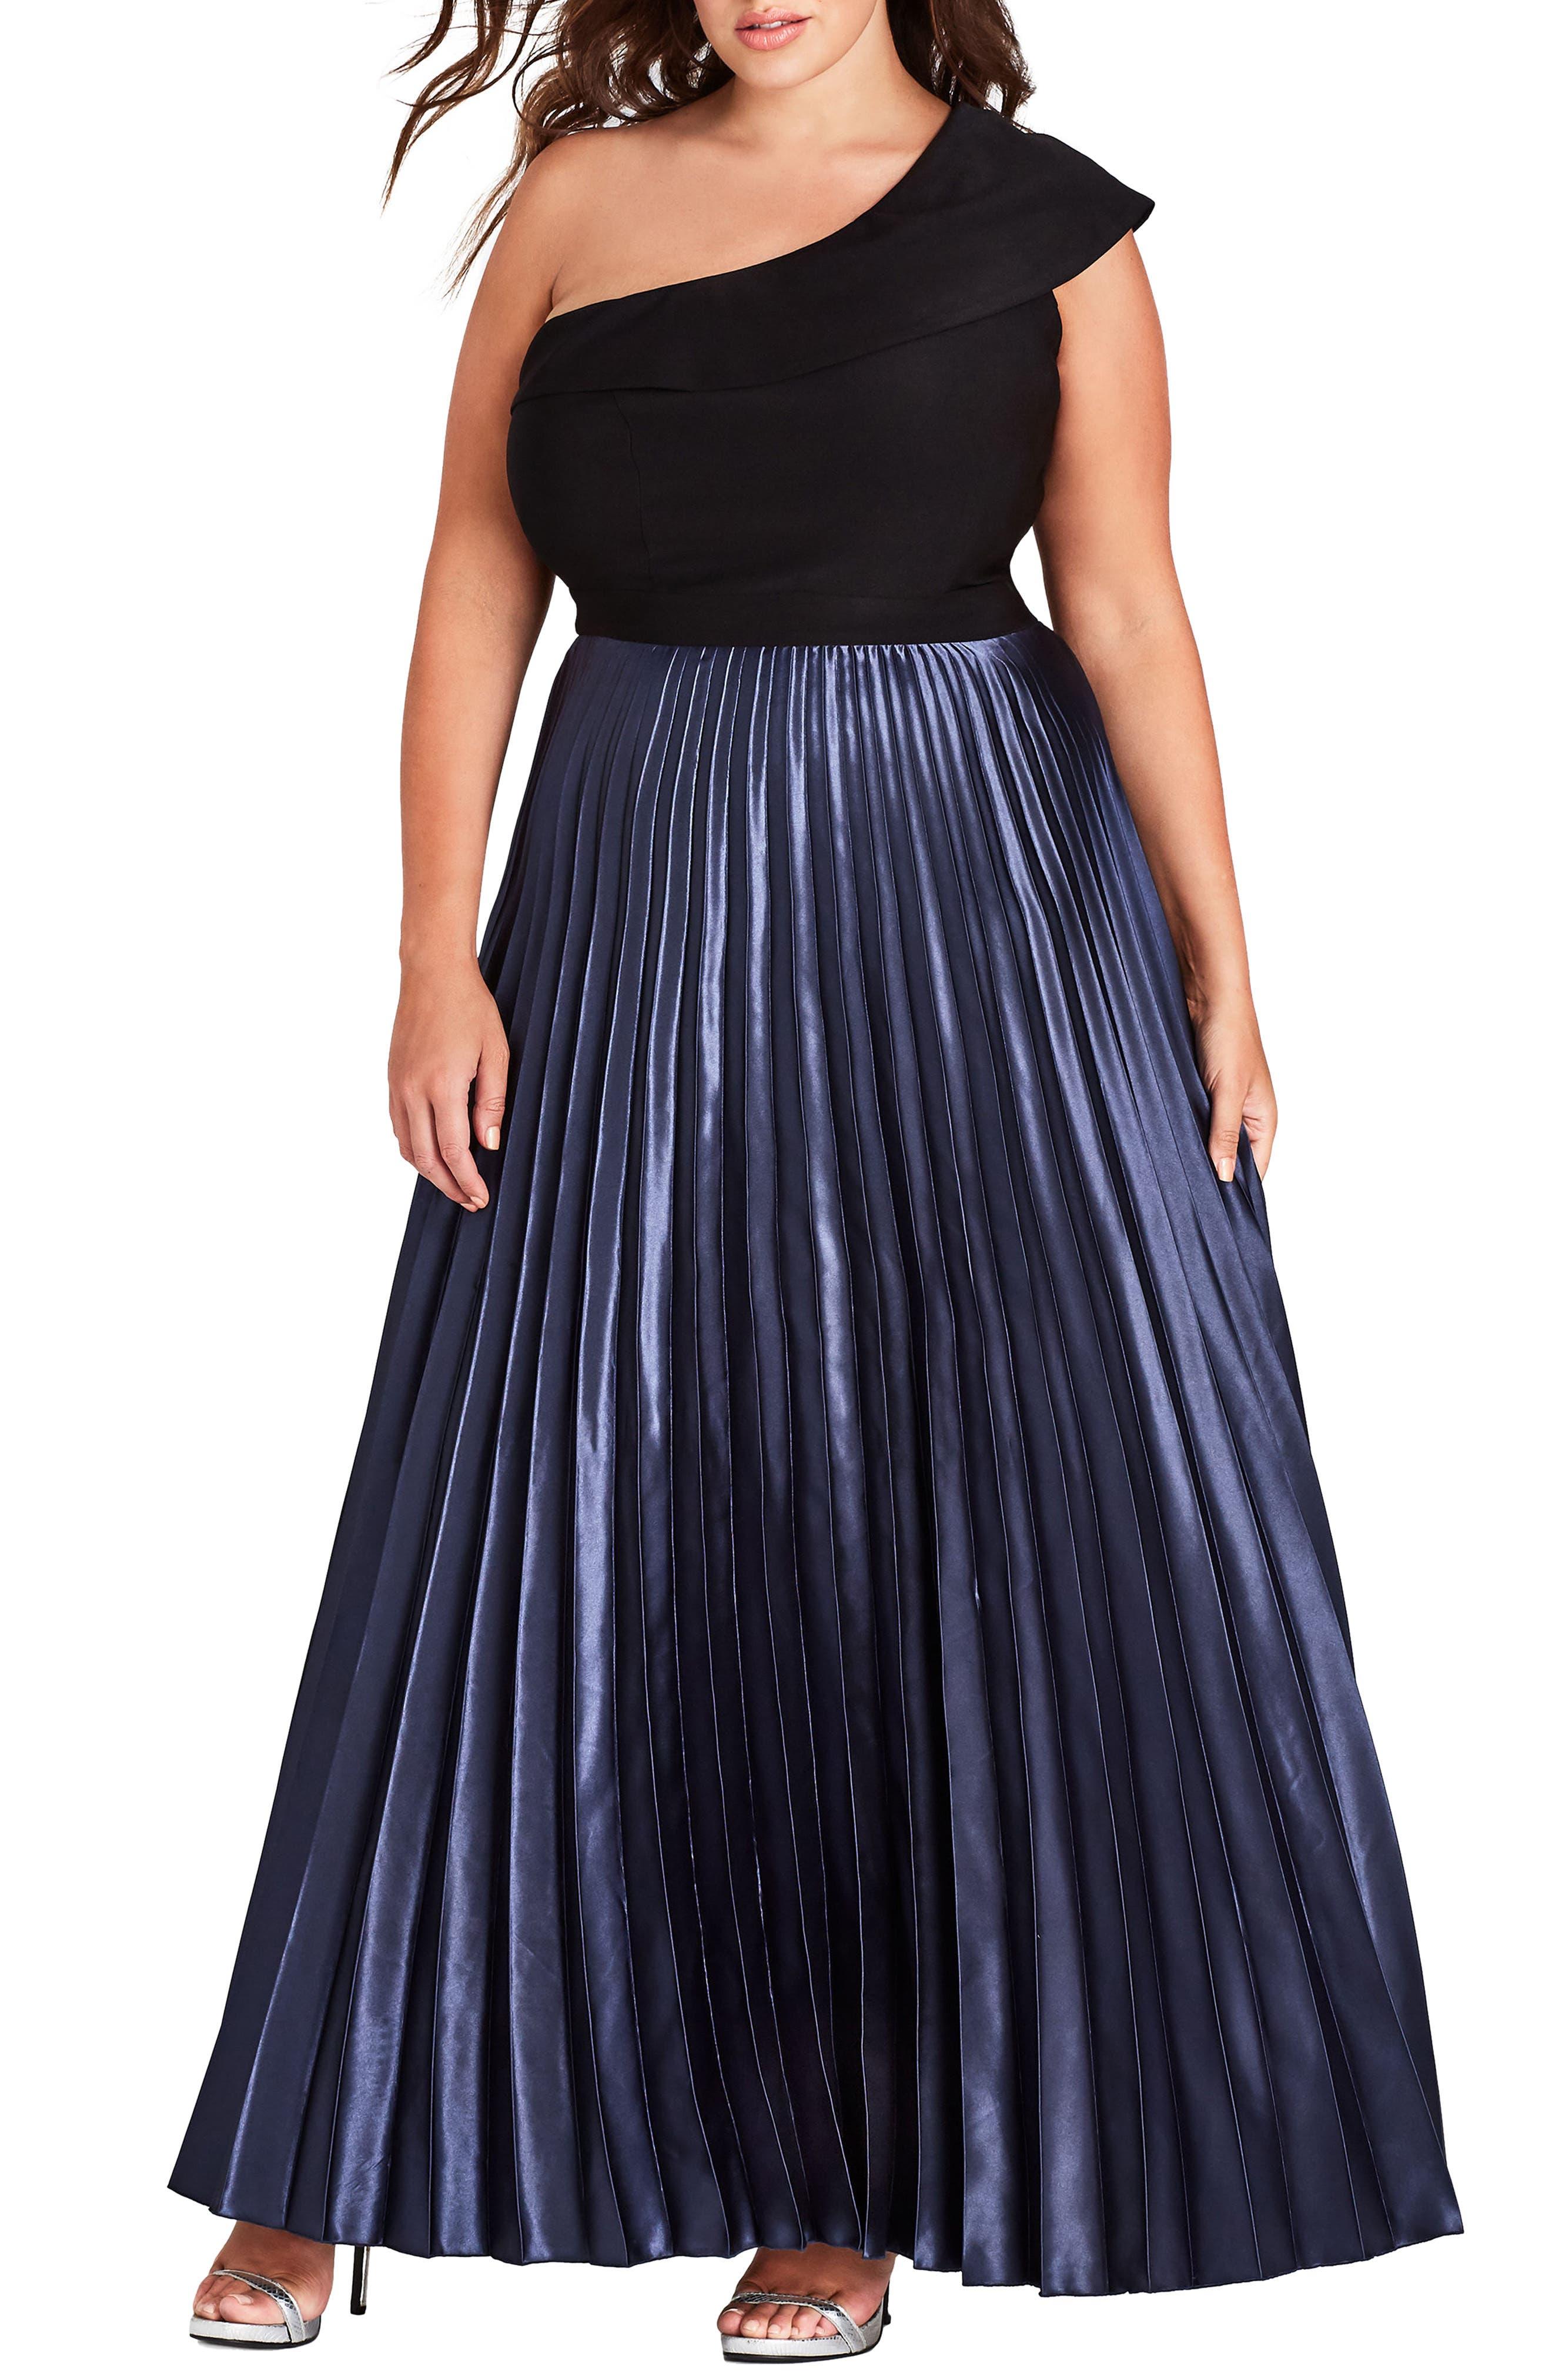 Rosa One Shoulder Pleat Maxi Dress,                         Main,                         color, Smoke